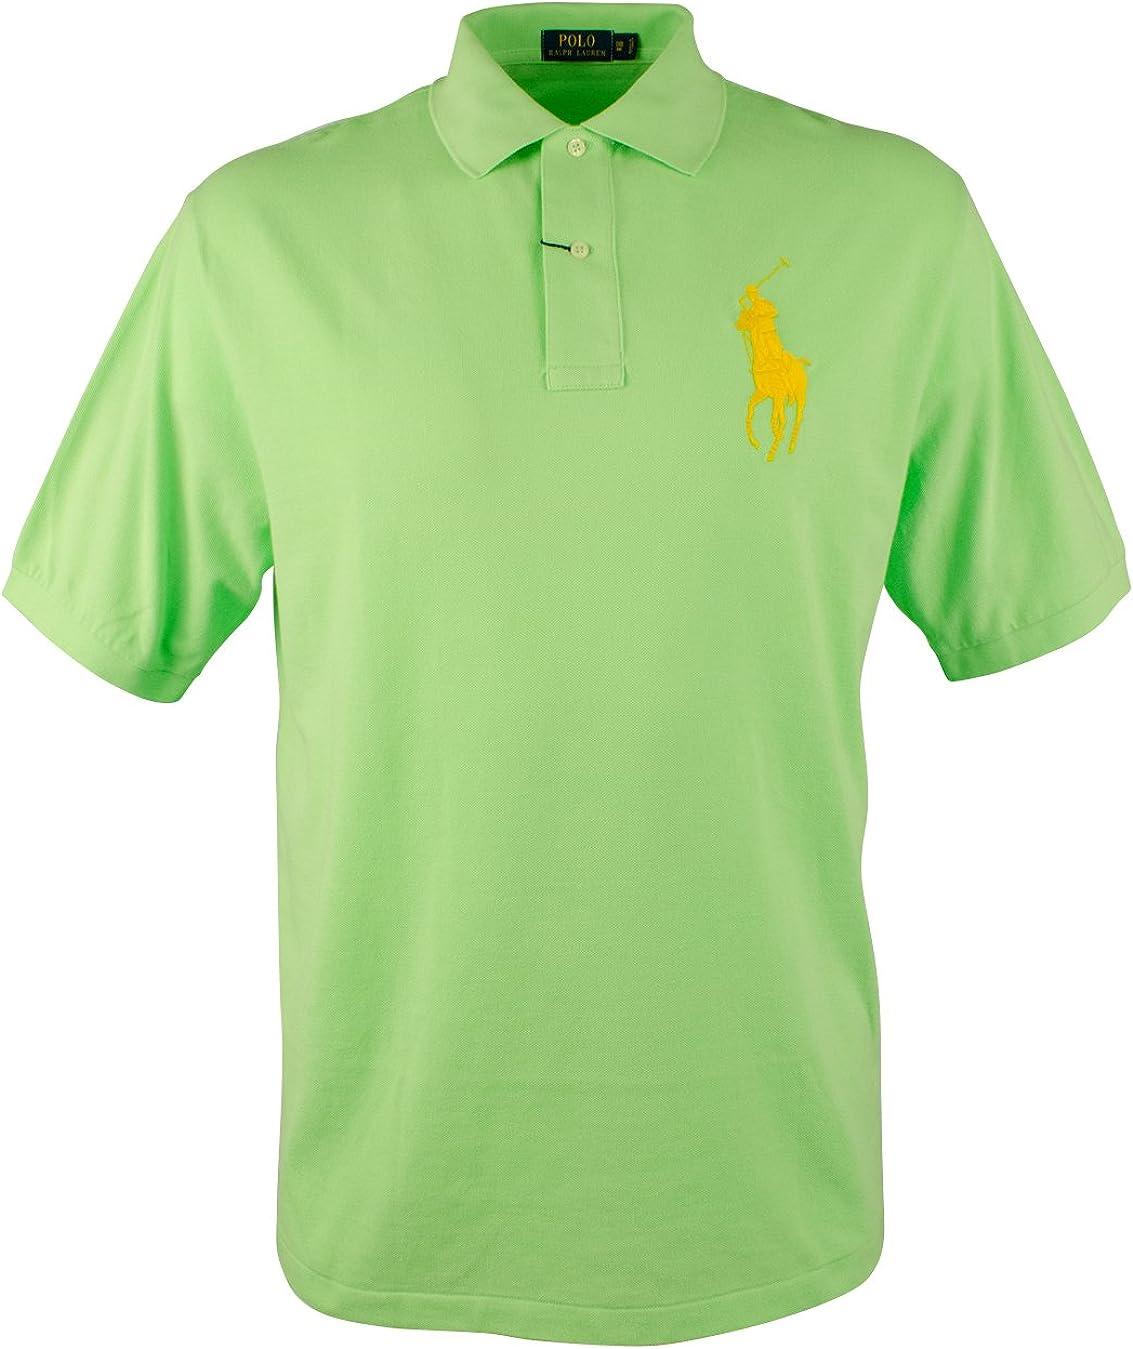 Men's Big&Tall Big Pony Short Sleeve Mesh Polo Shirts-FG-1XB